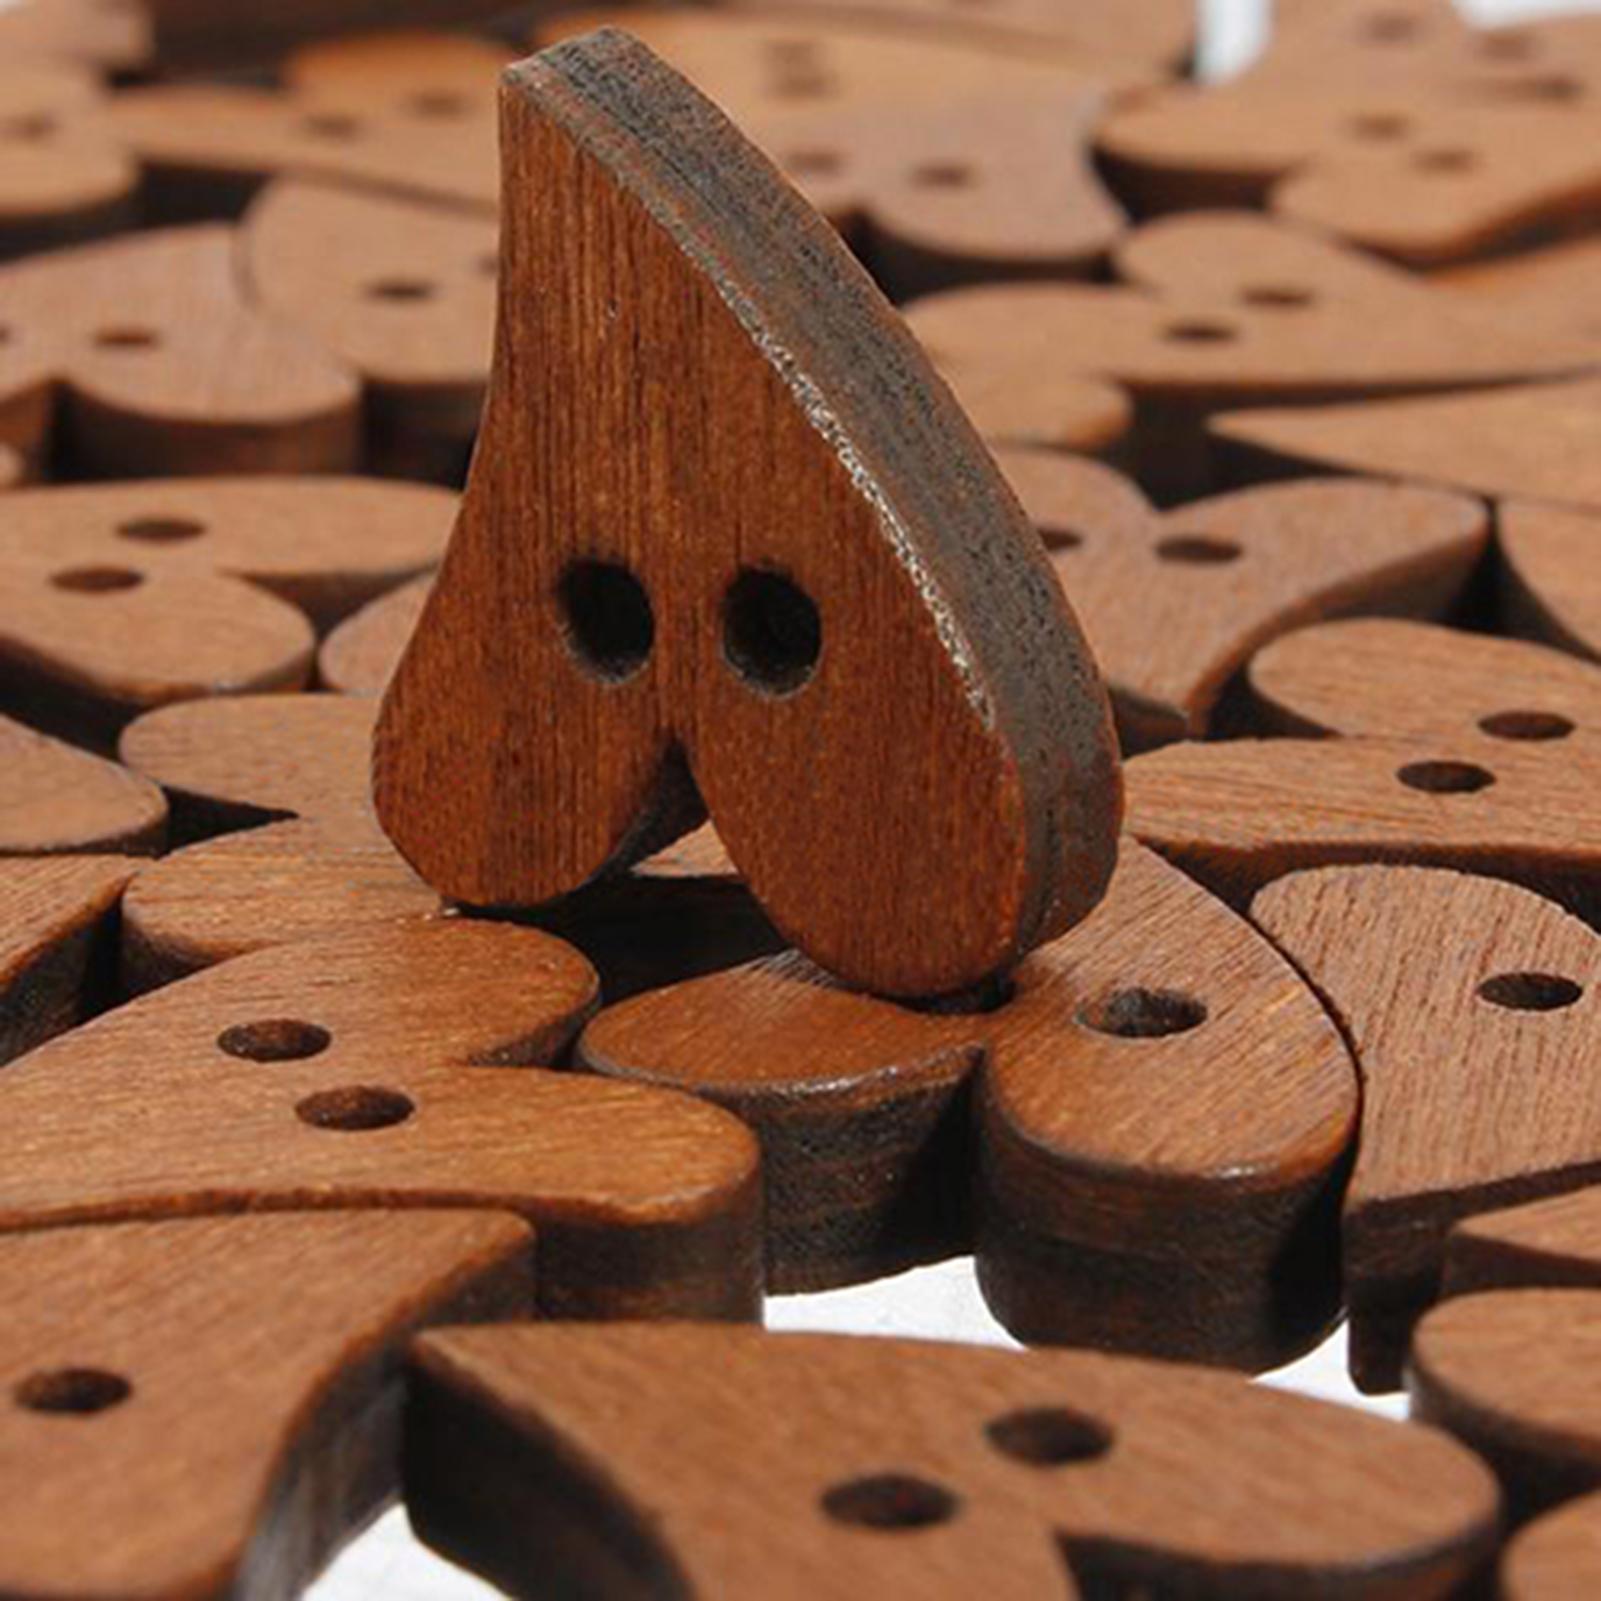 100Pcs Mini Wooden 2-Hole Heart Shape Button DIY Sewing Scrapbooking Tool Nett